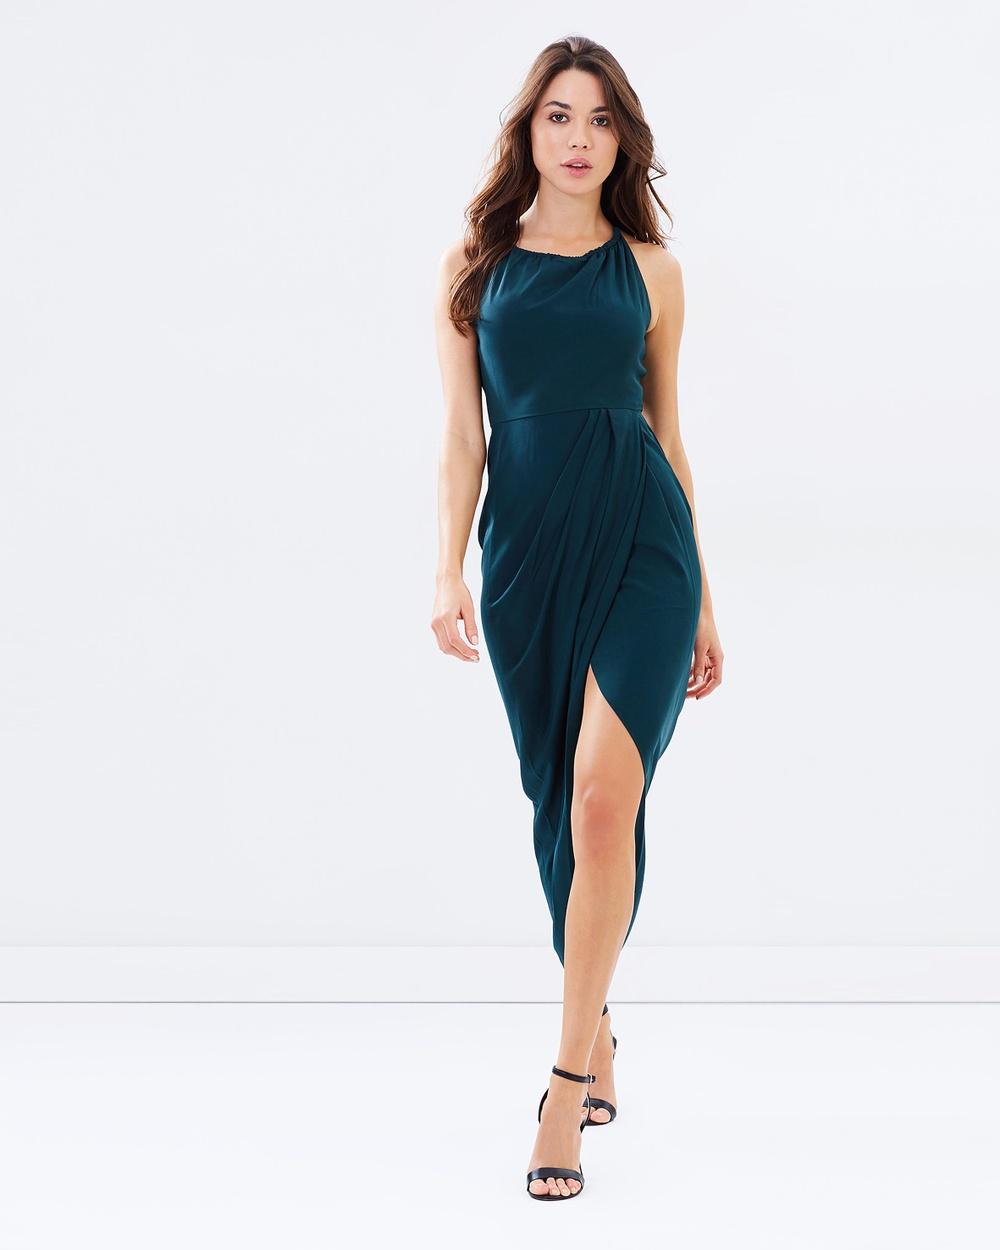 bc3f538b992 Shona Joy Core High Neck Ruched Dress Bridesmaid Dresses Seaweed Core High  Neck Ruched Dress